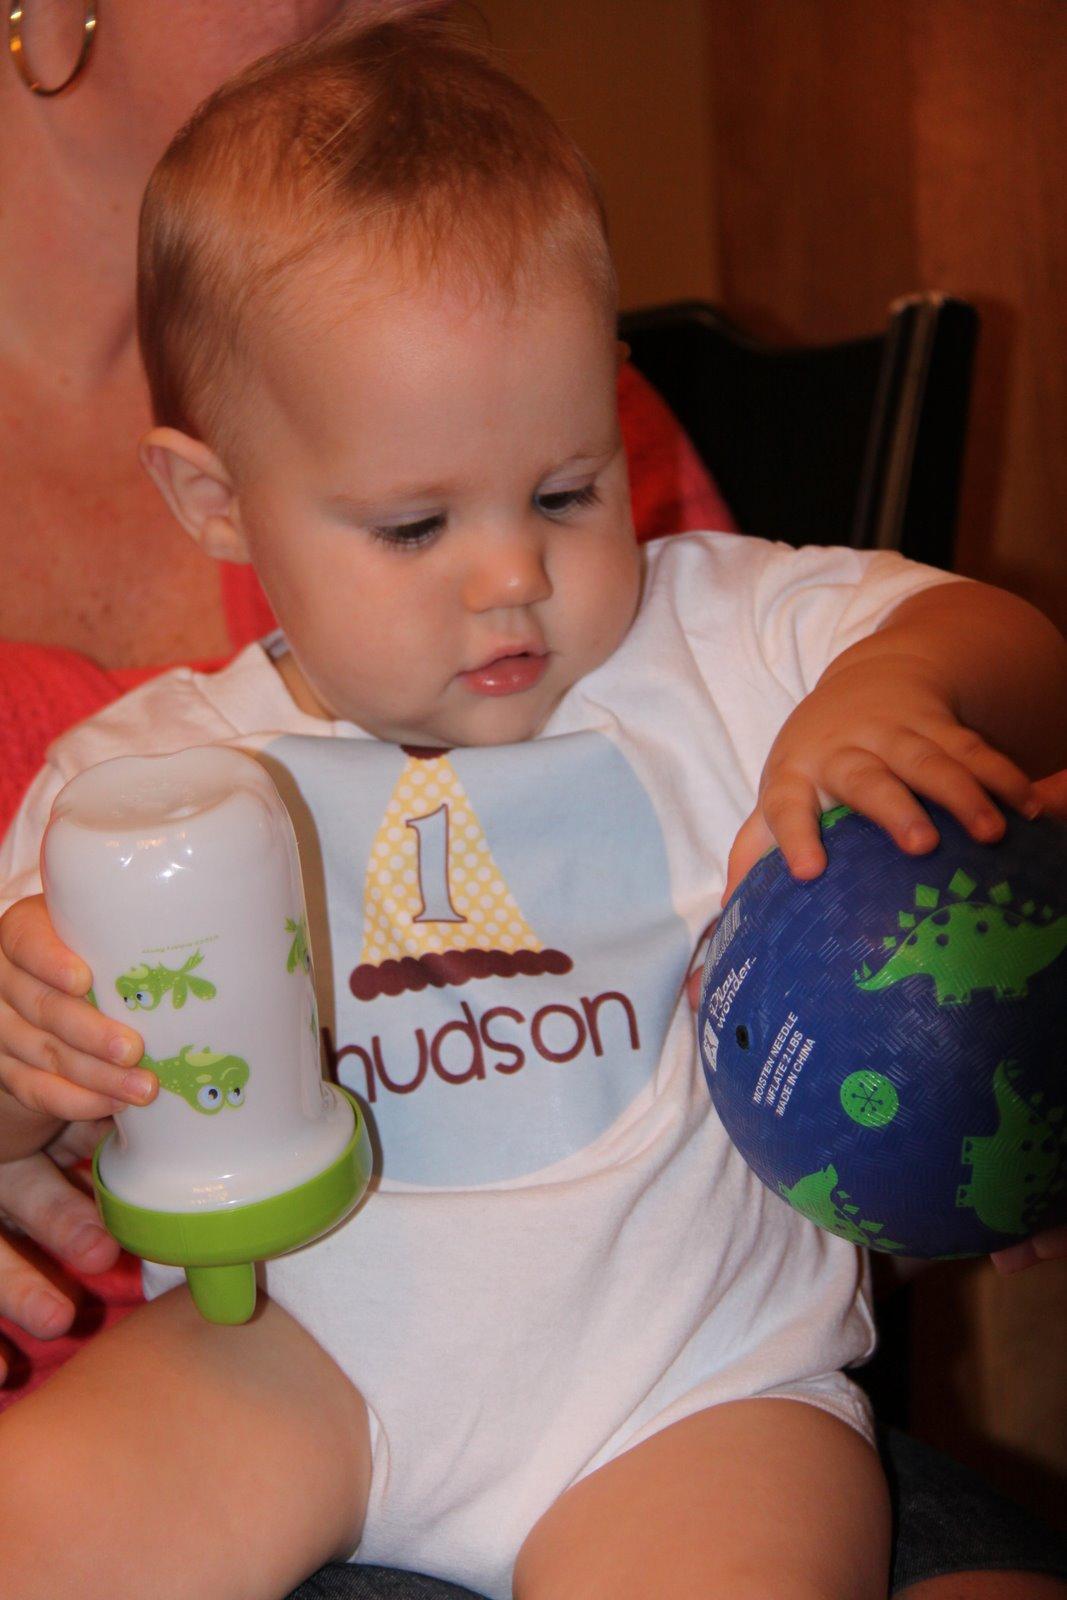 [shirt+hudson+baby+pic+2]